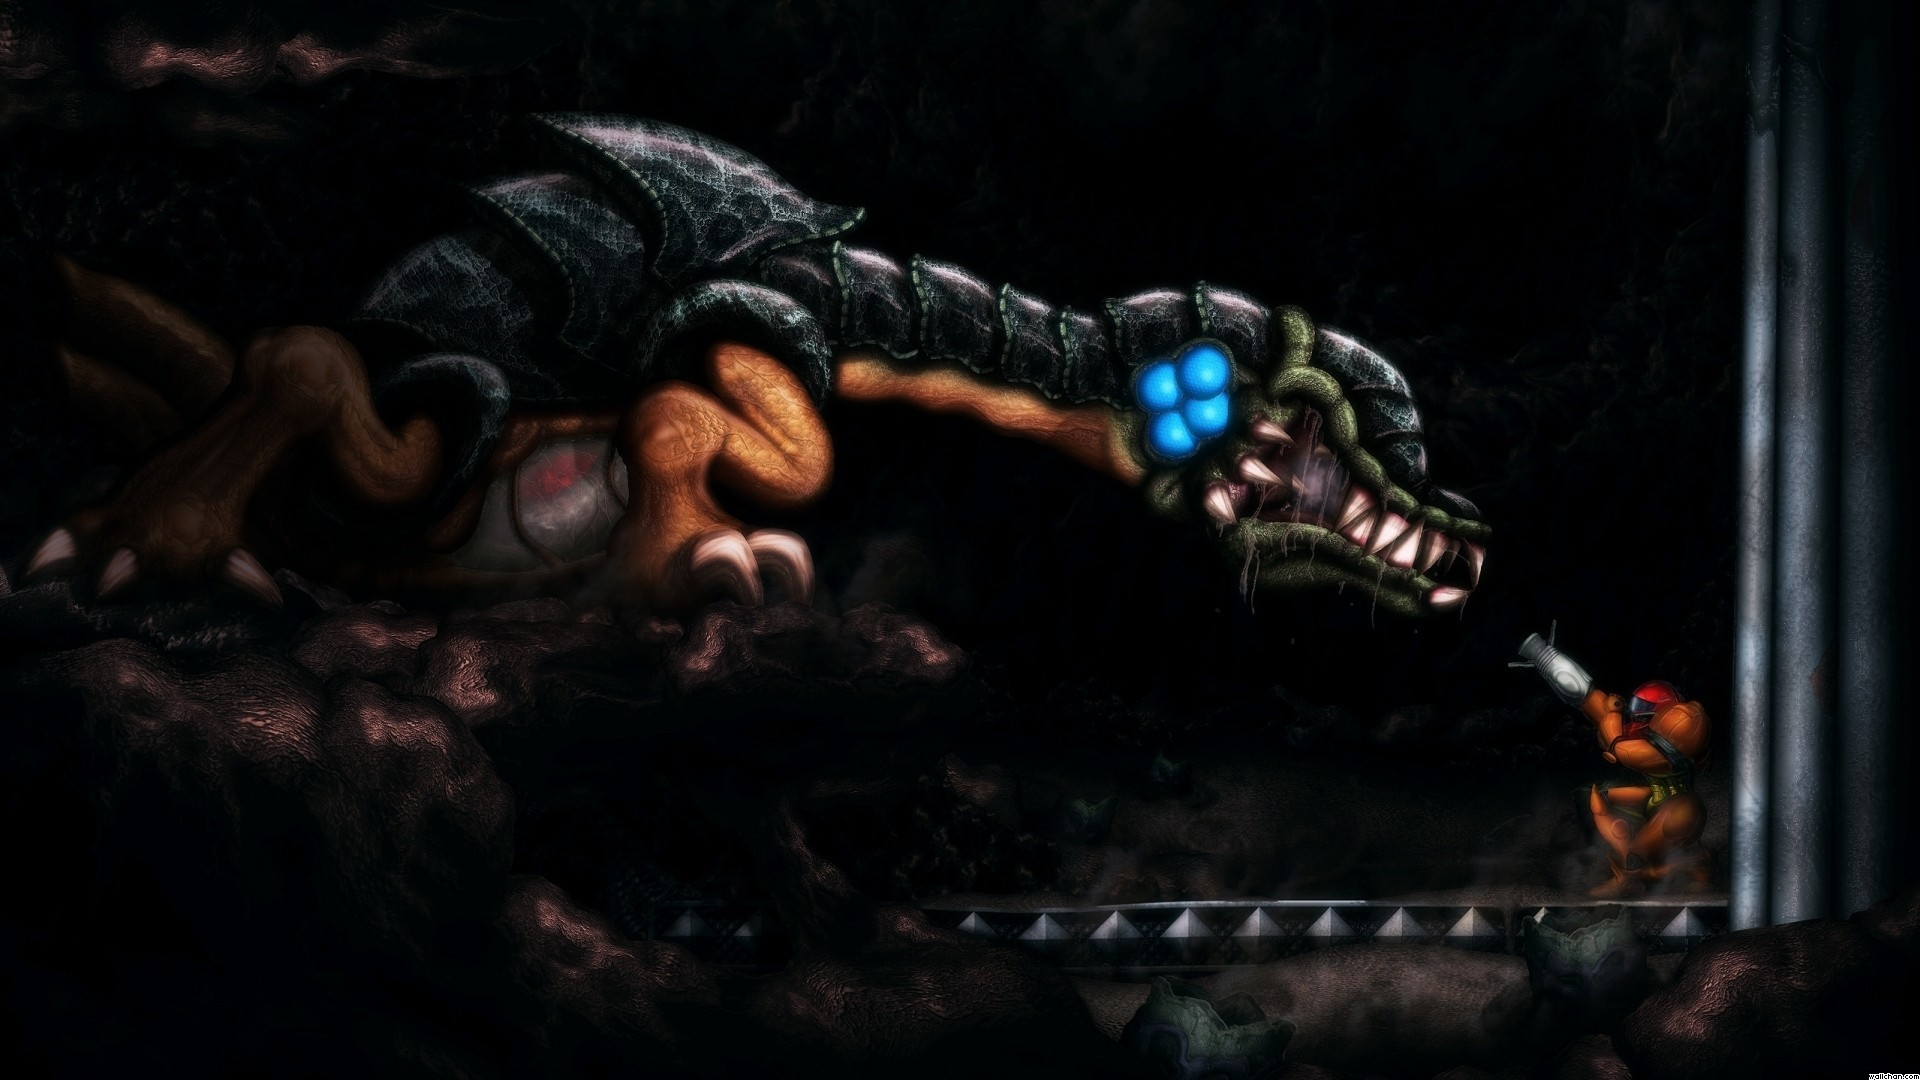 6 Metroid II: Return of Samus HD Wallpapers | Backgrounds – Wallpaper Abyss